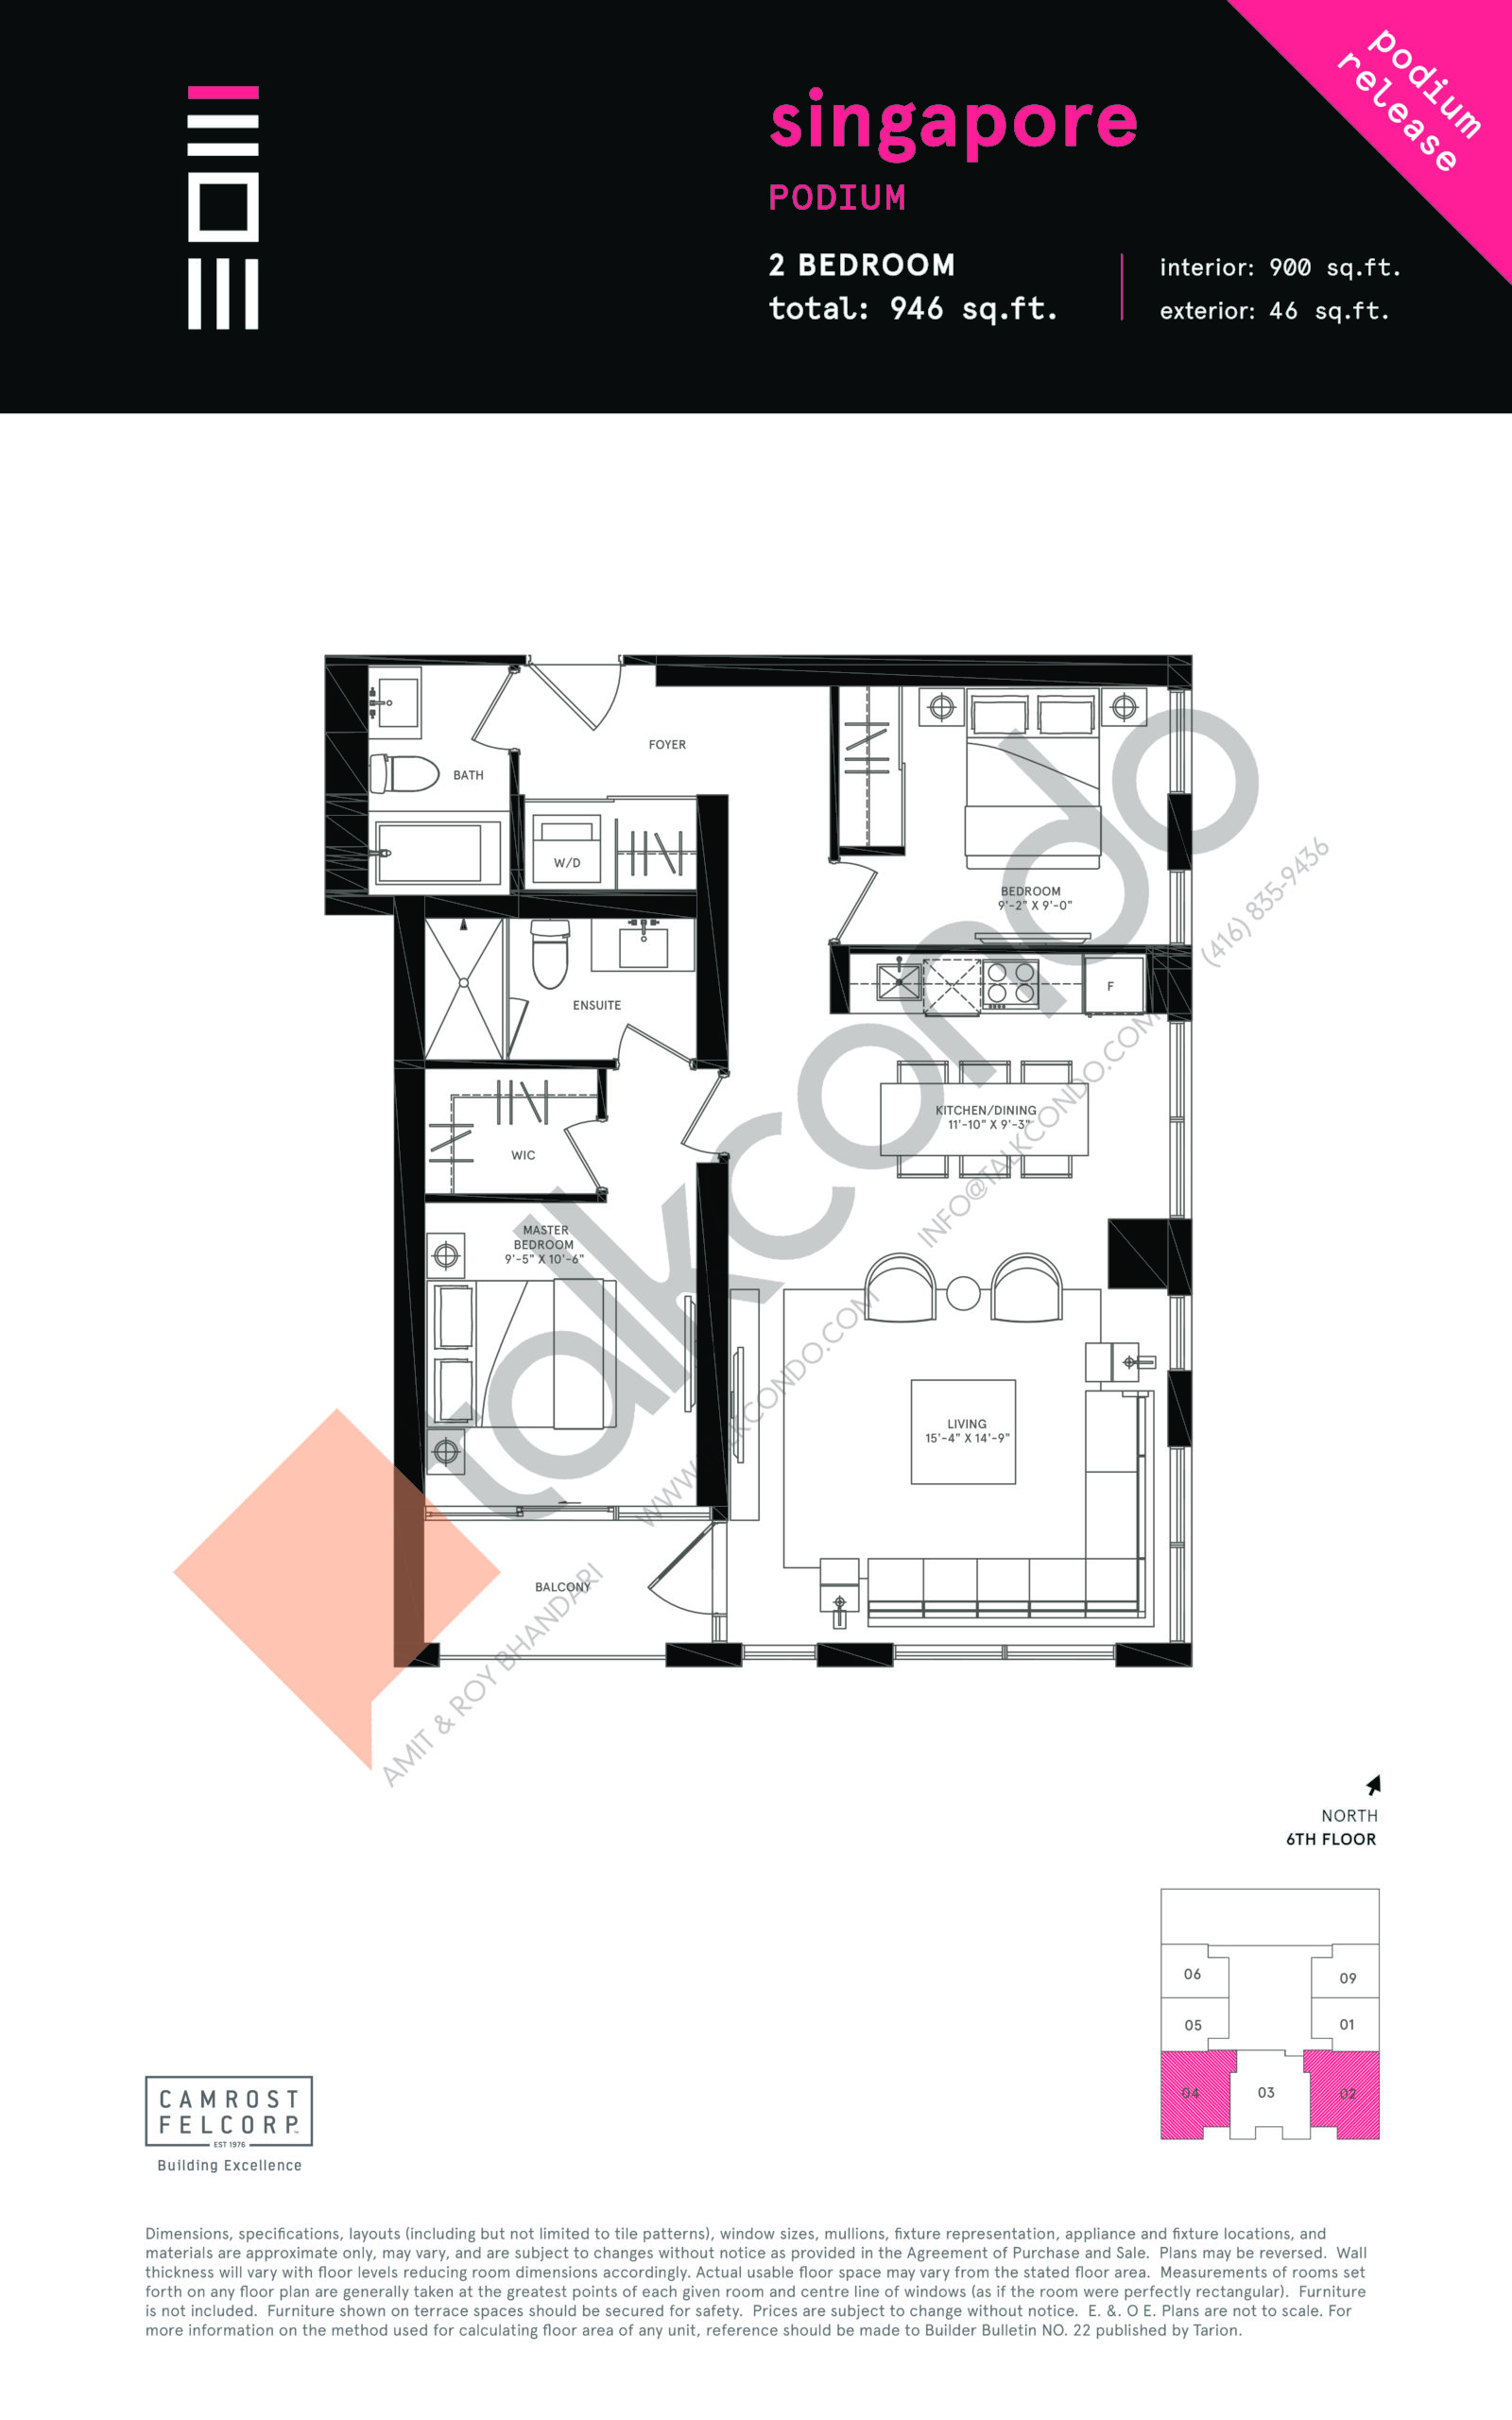 Singapore - Podium Floor Plan at Exchange District Condos - 900 sq.ft